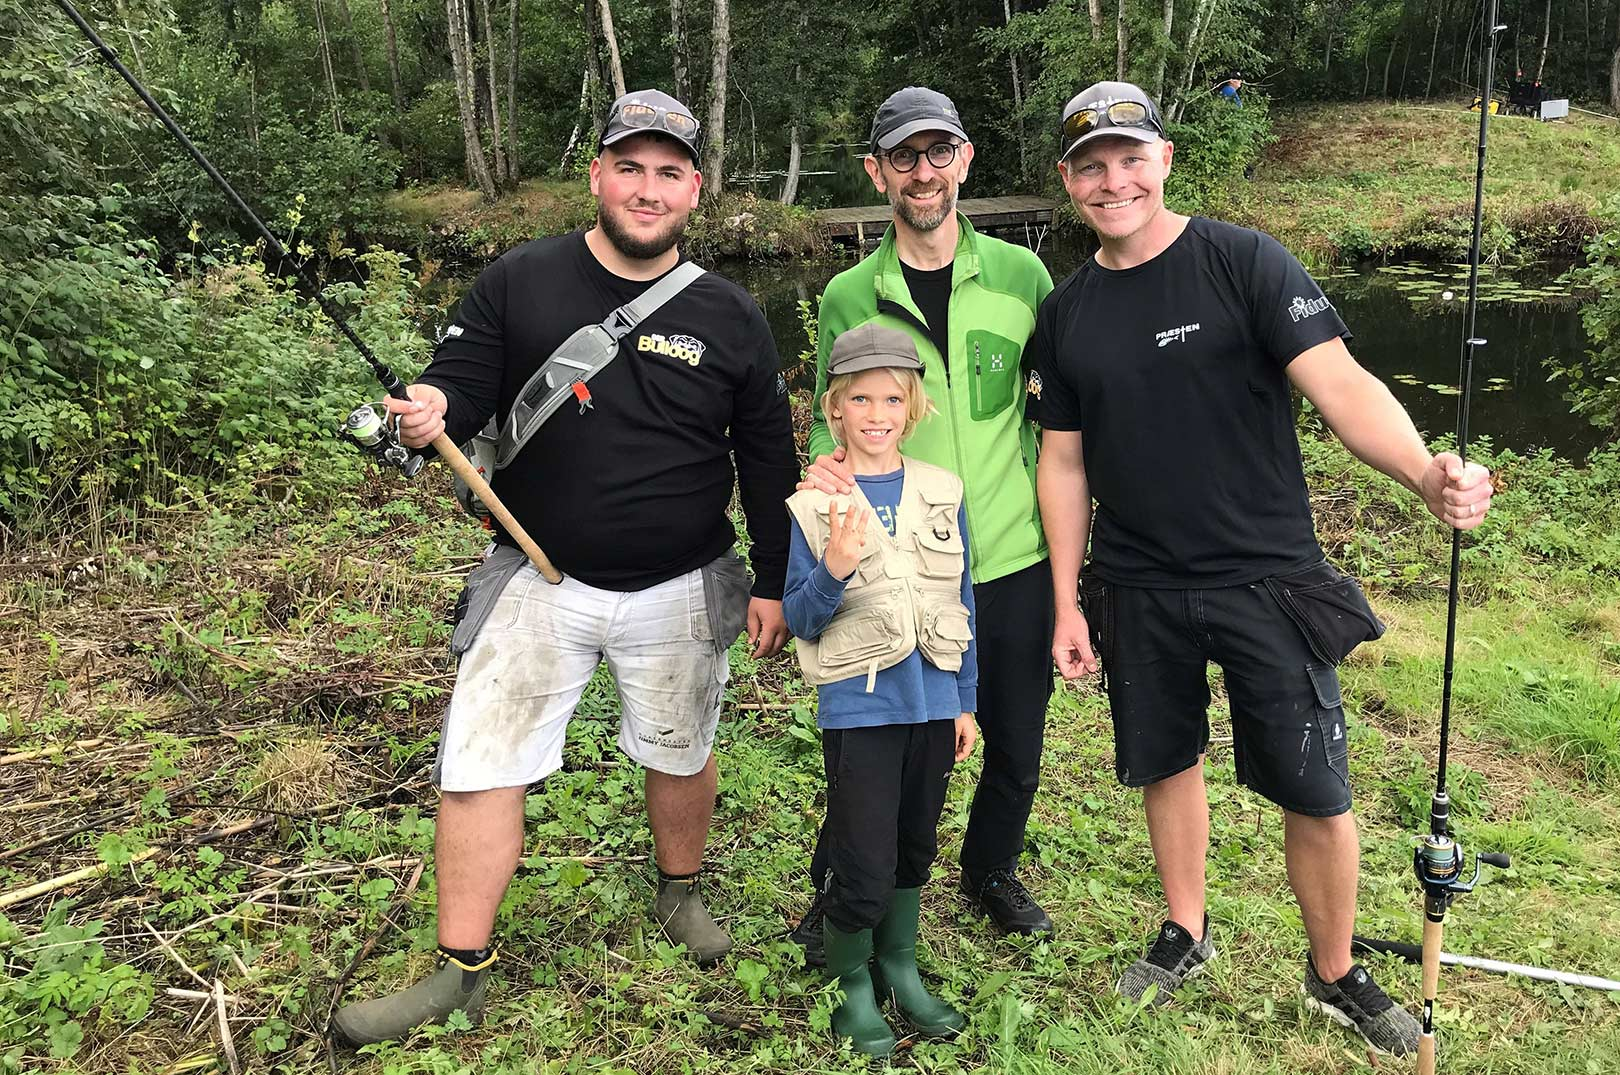 På turen mødte Sebastian og hans far faktrisk gutterne fra Præsten - bla Casper Bjerregaard Larsen, som du kan se til højre.